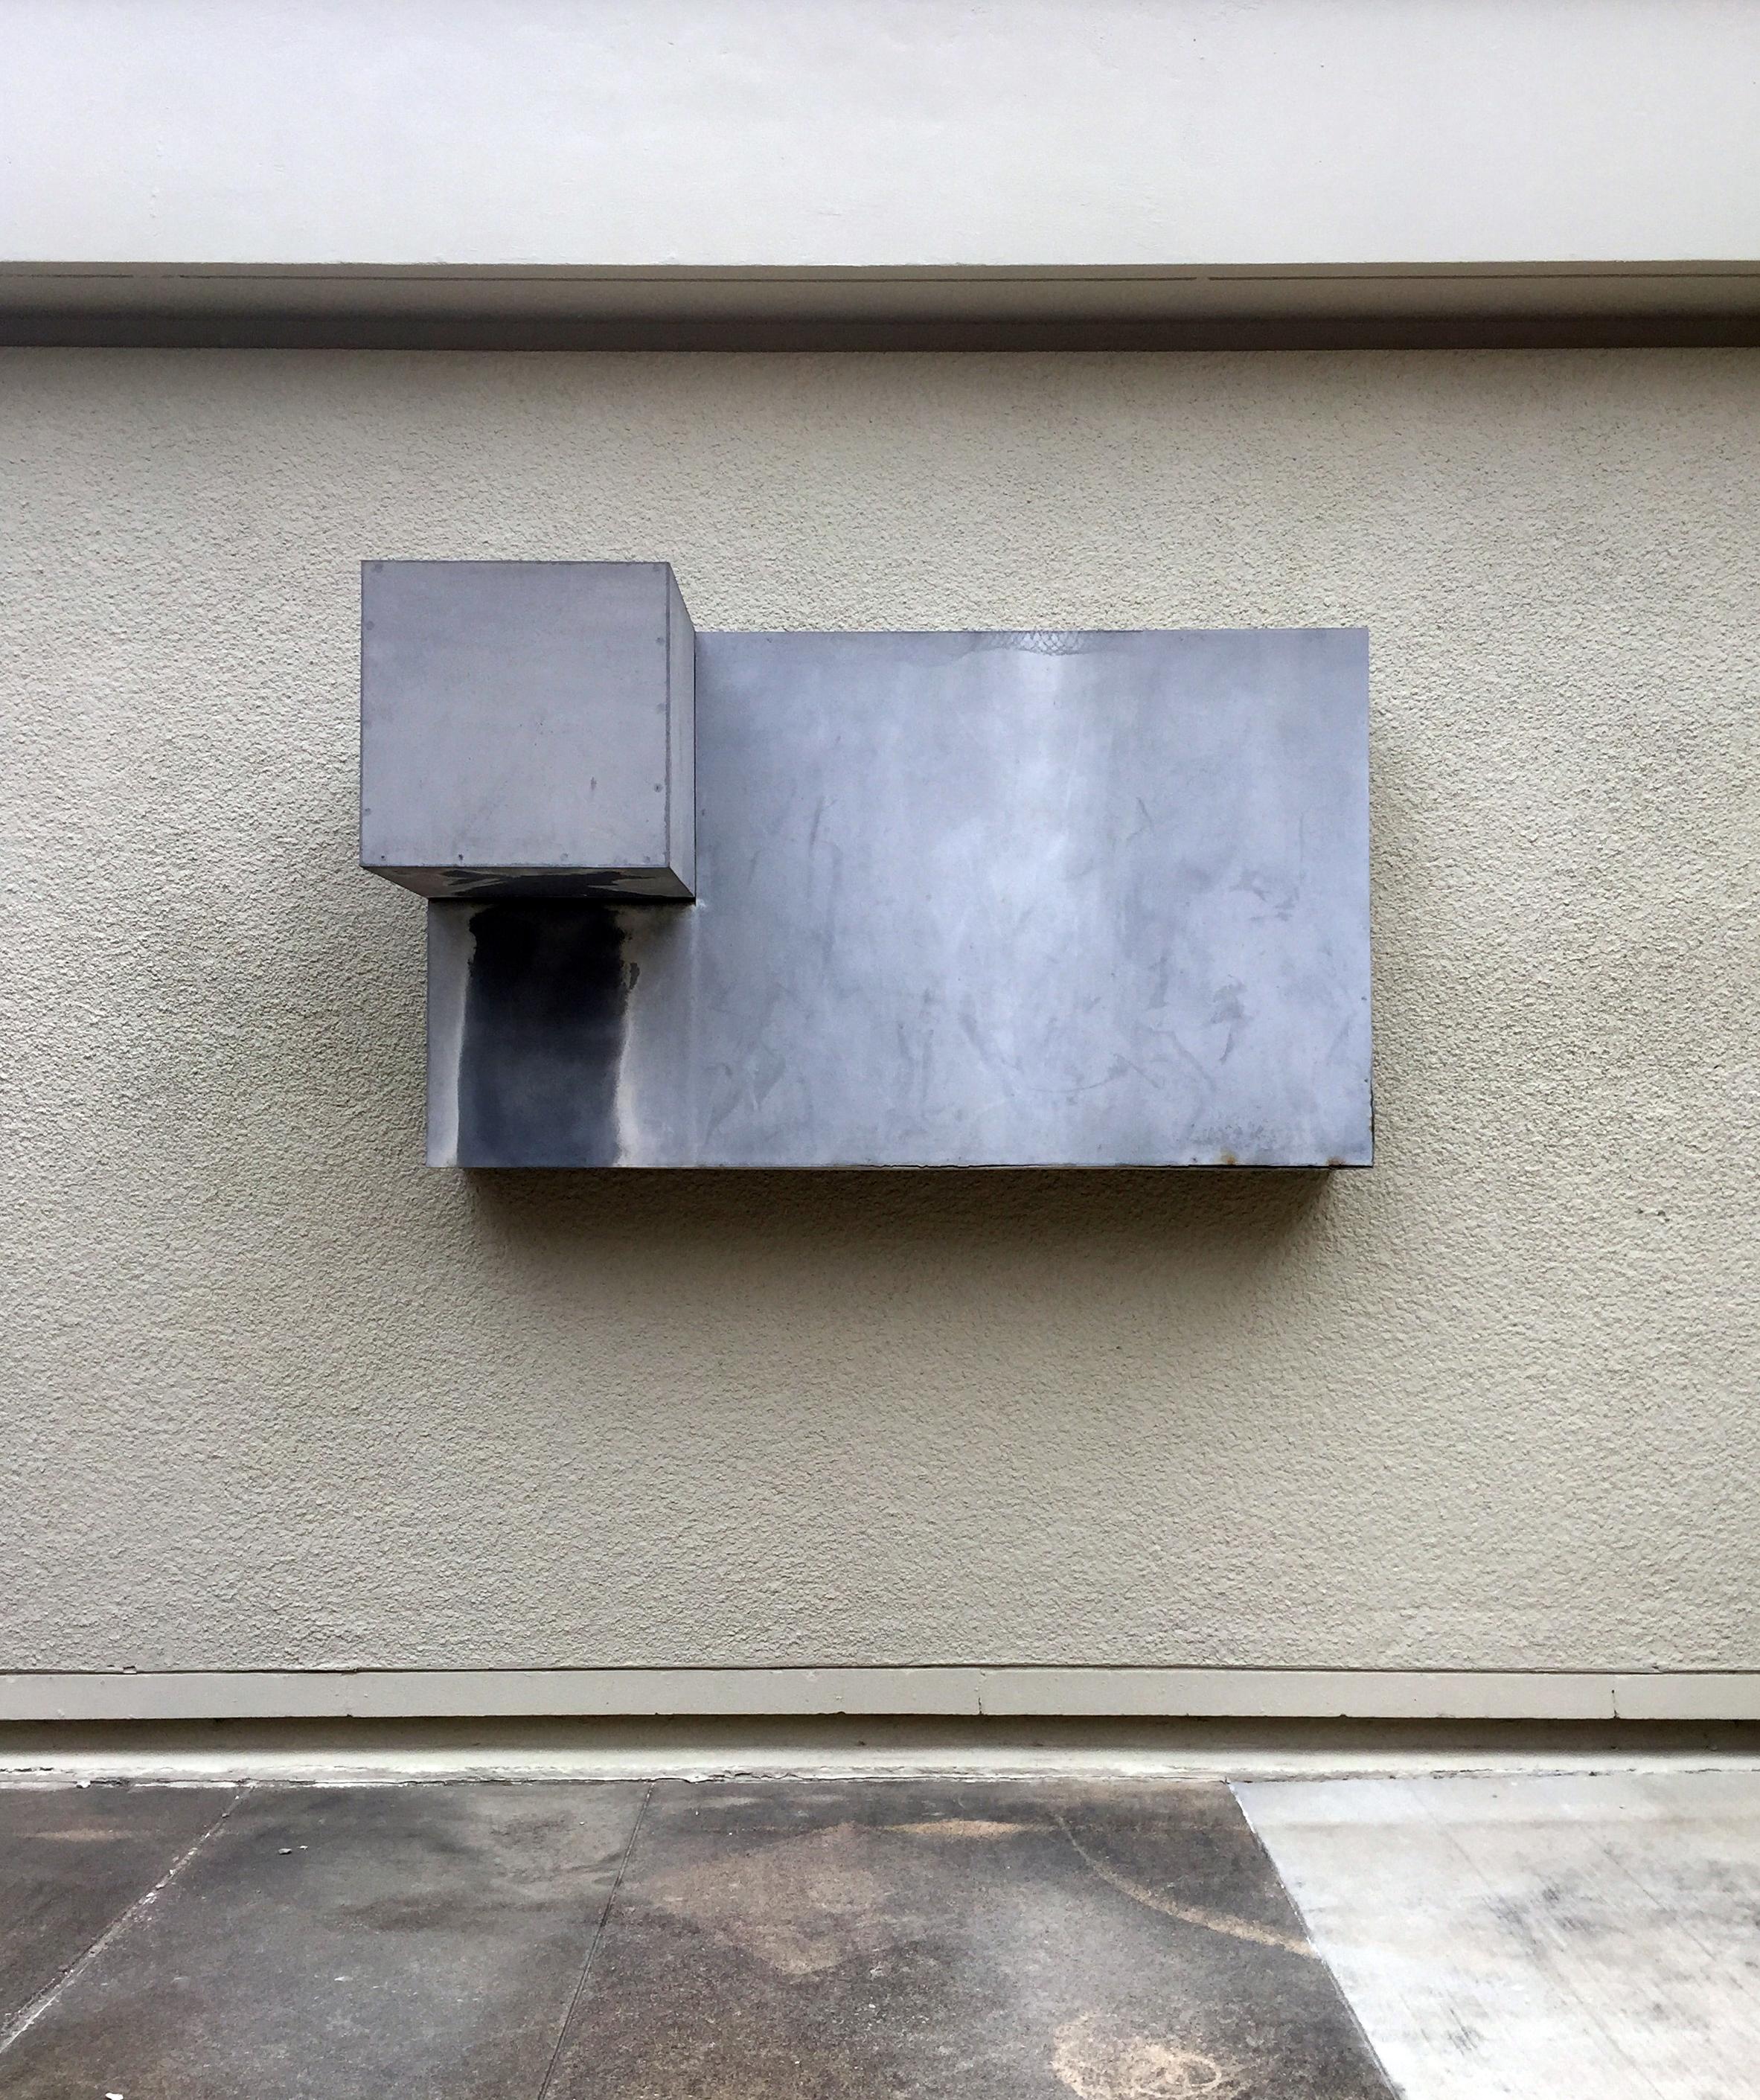 Untitled, Raffaele Martini Pandozy, metal sculpture, 1976